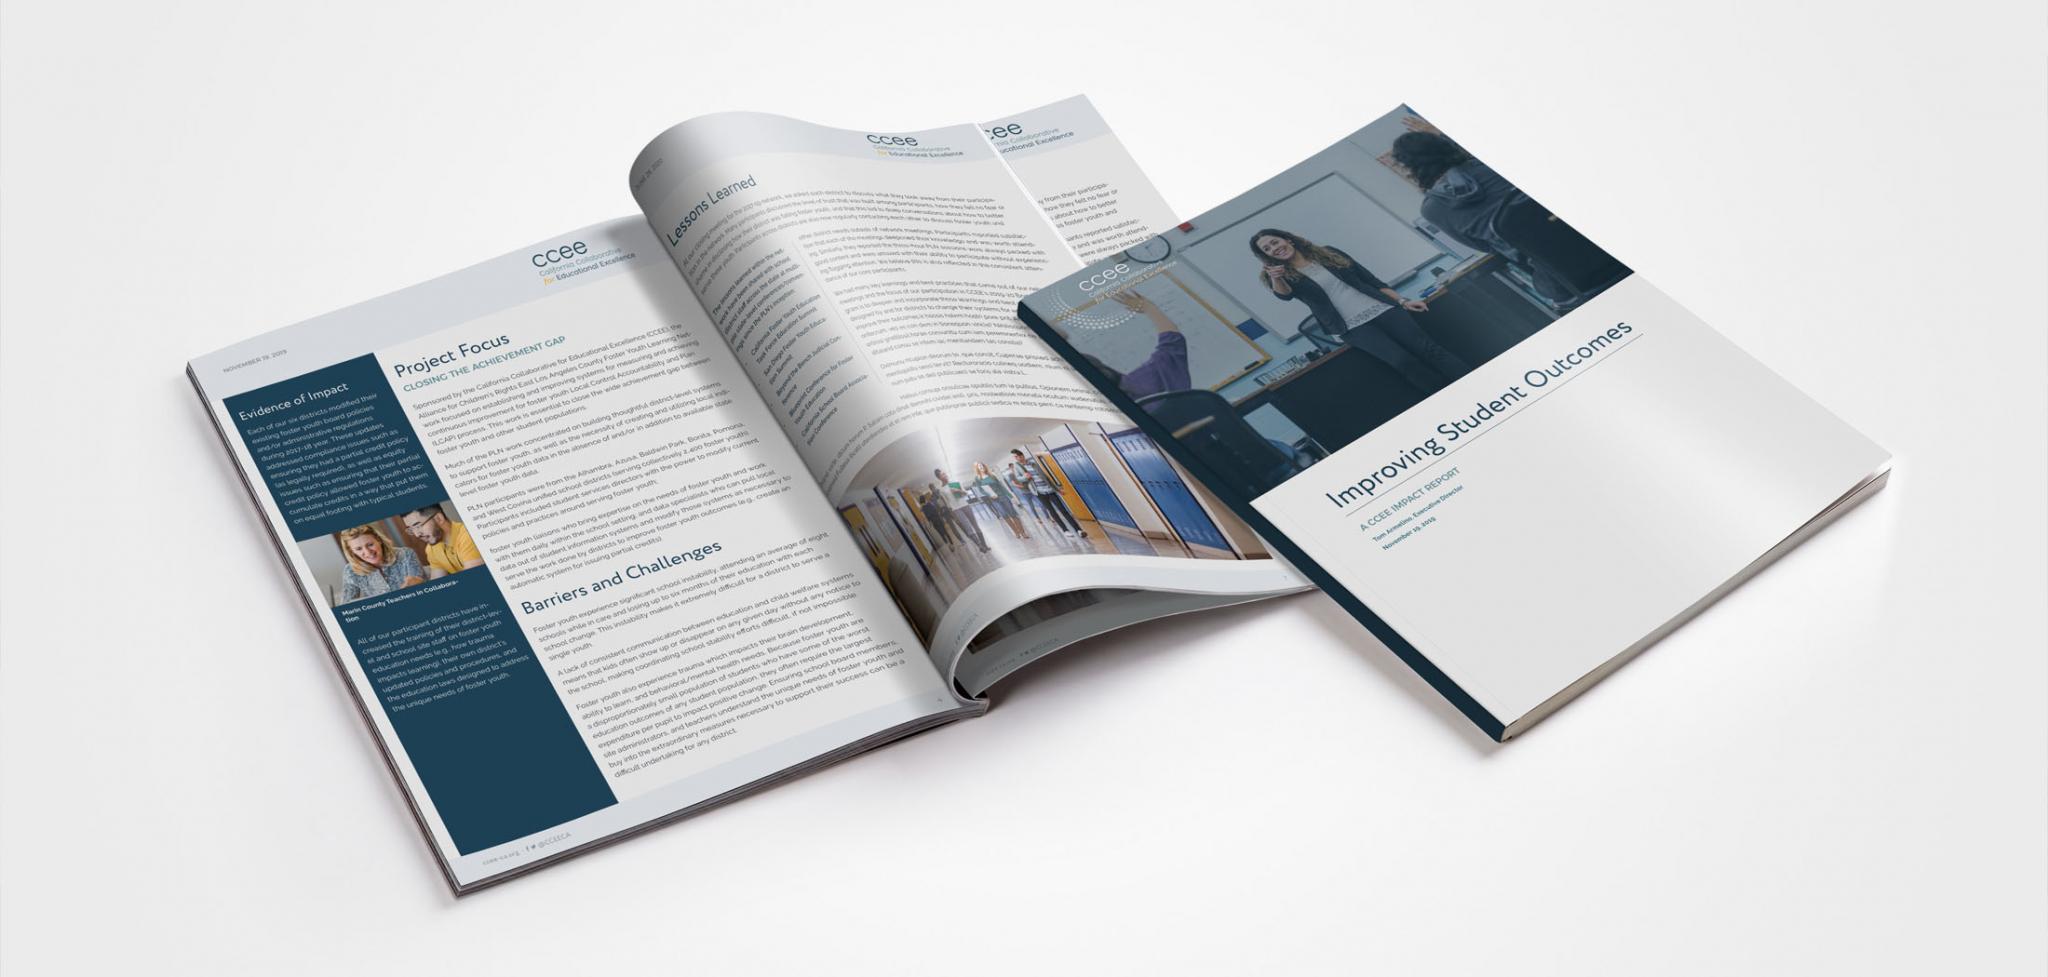 CCEE State Agency Rebranding Print Design